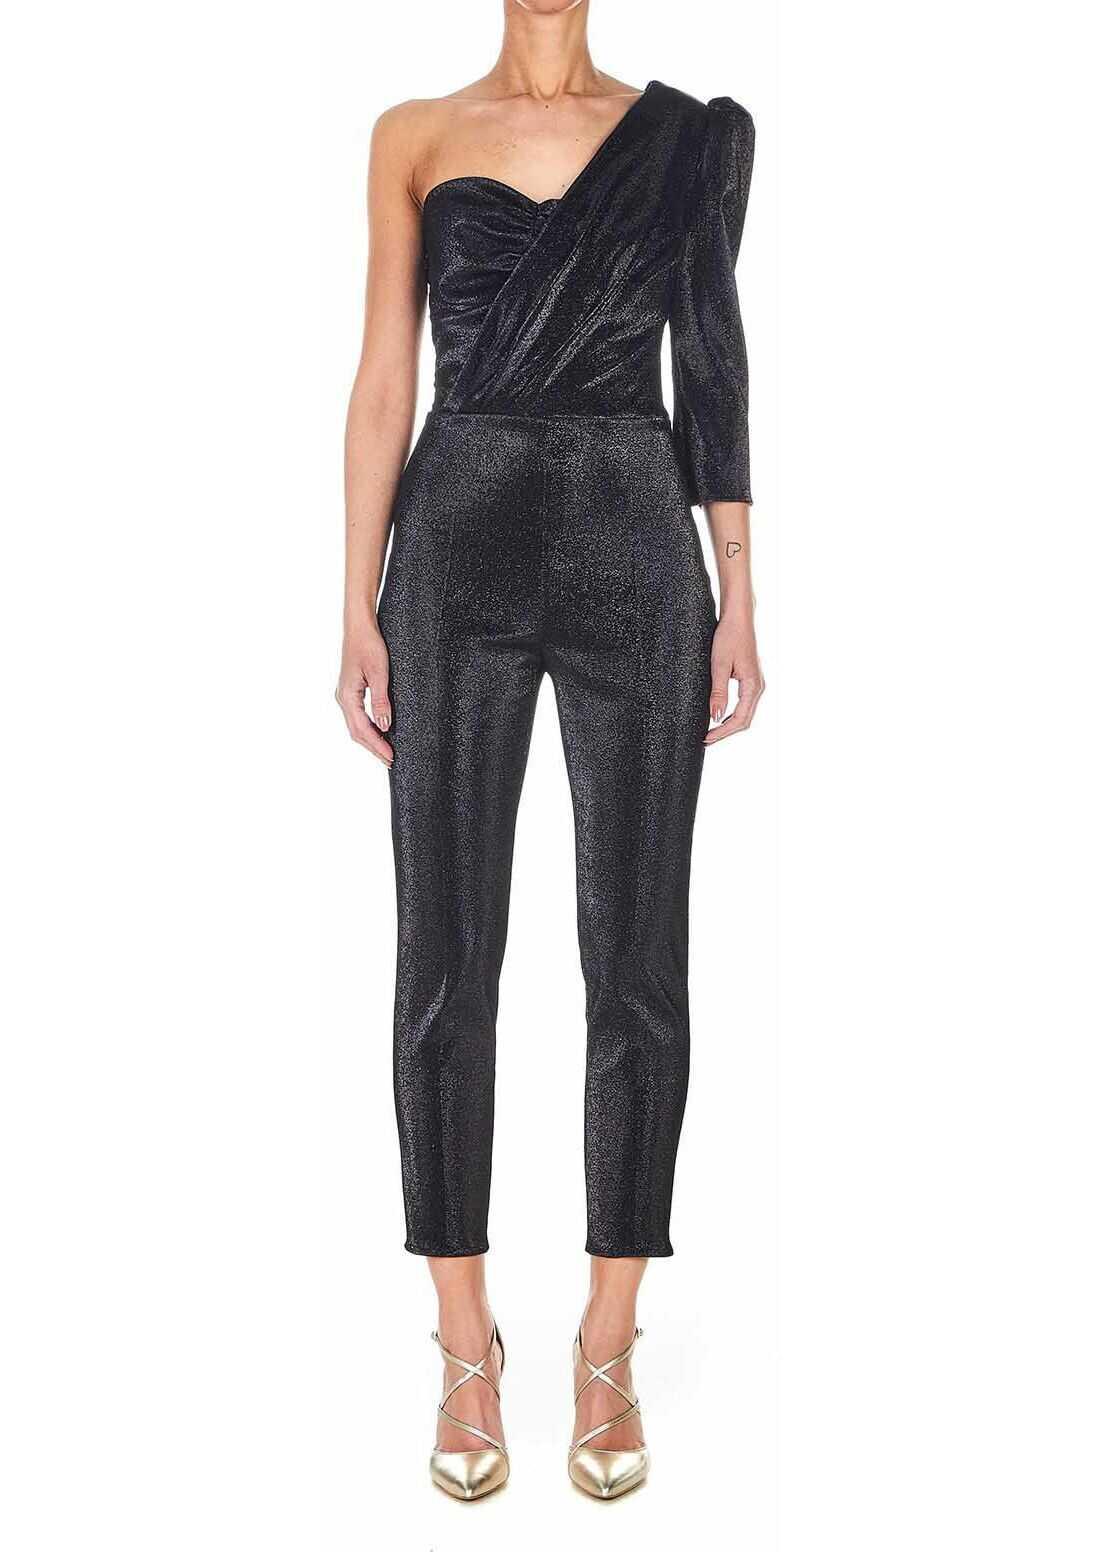 Elisabetta Franchi Jumpsuit with glitter finish Black